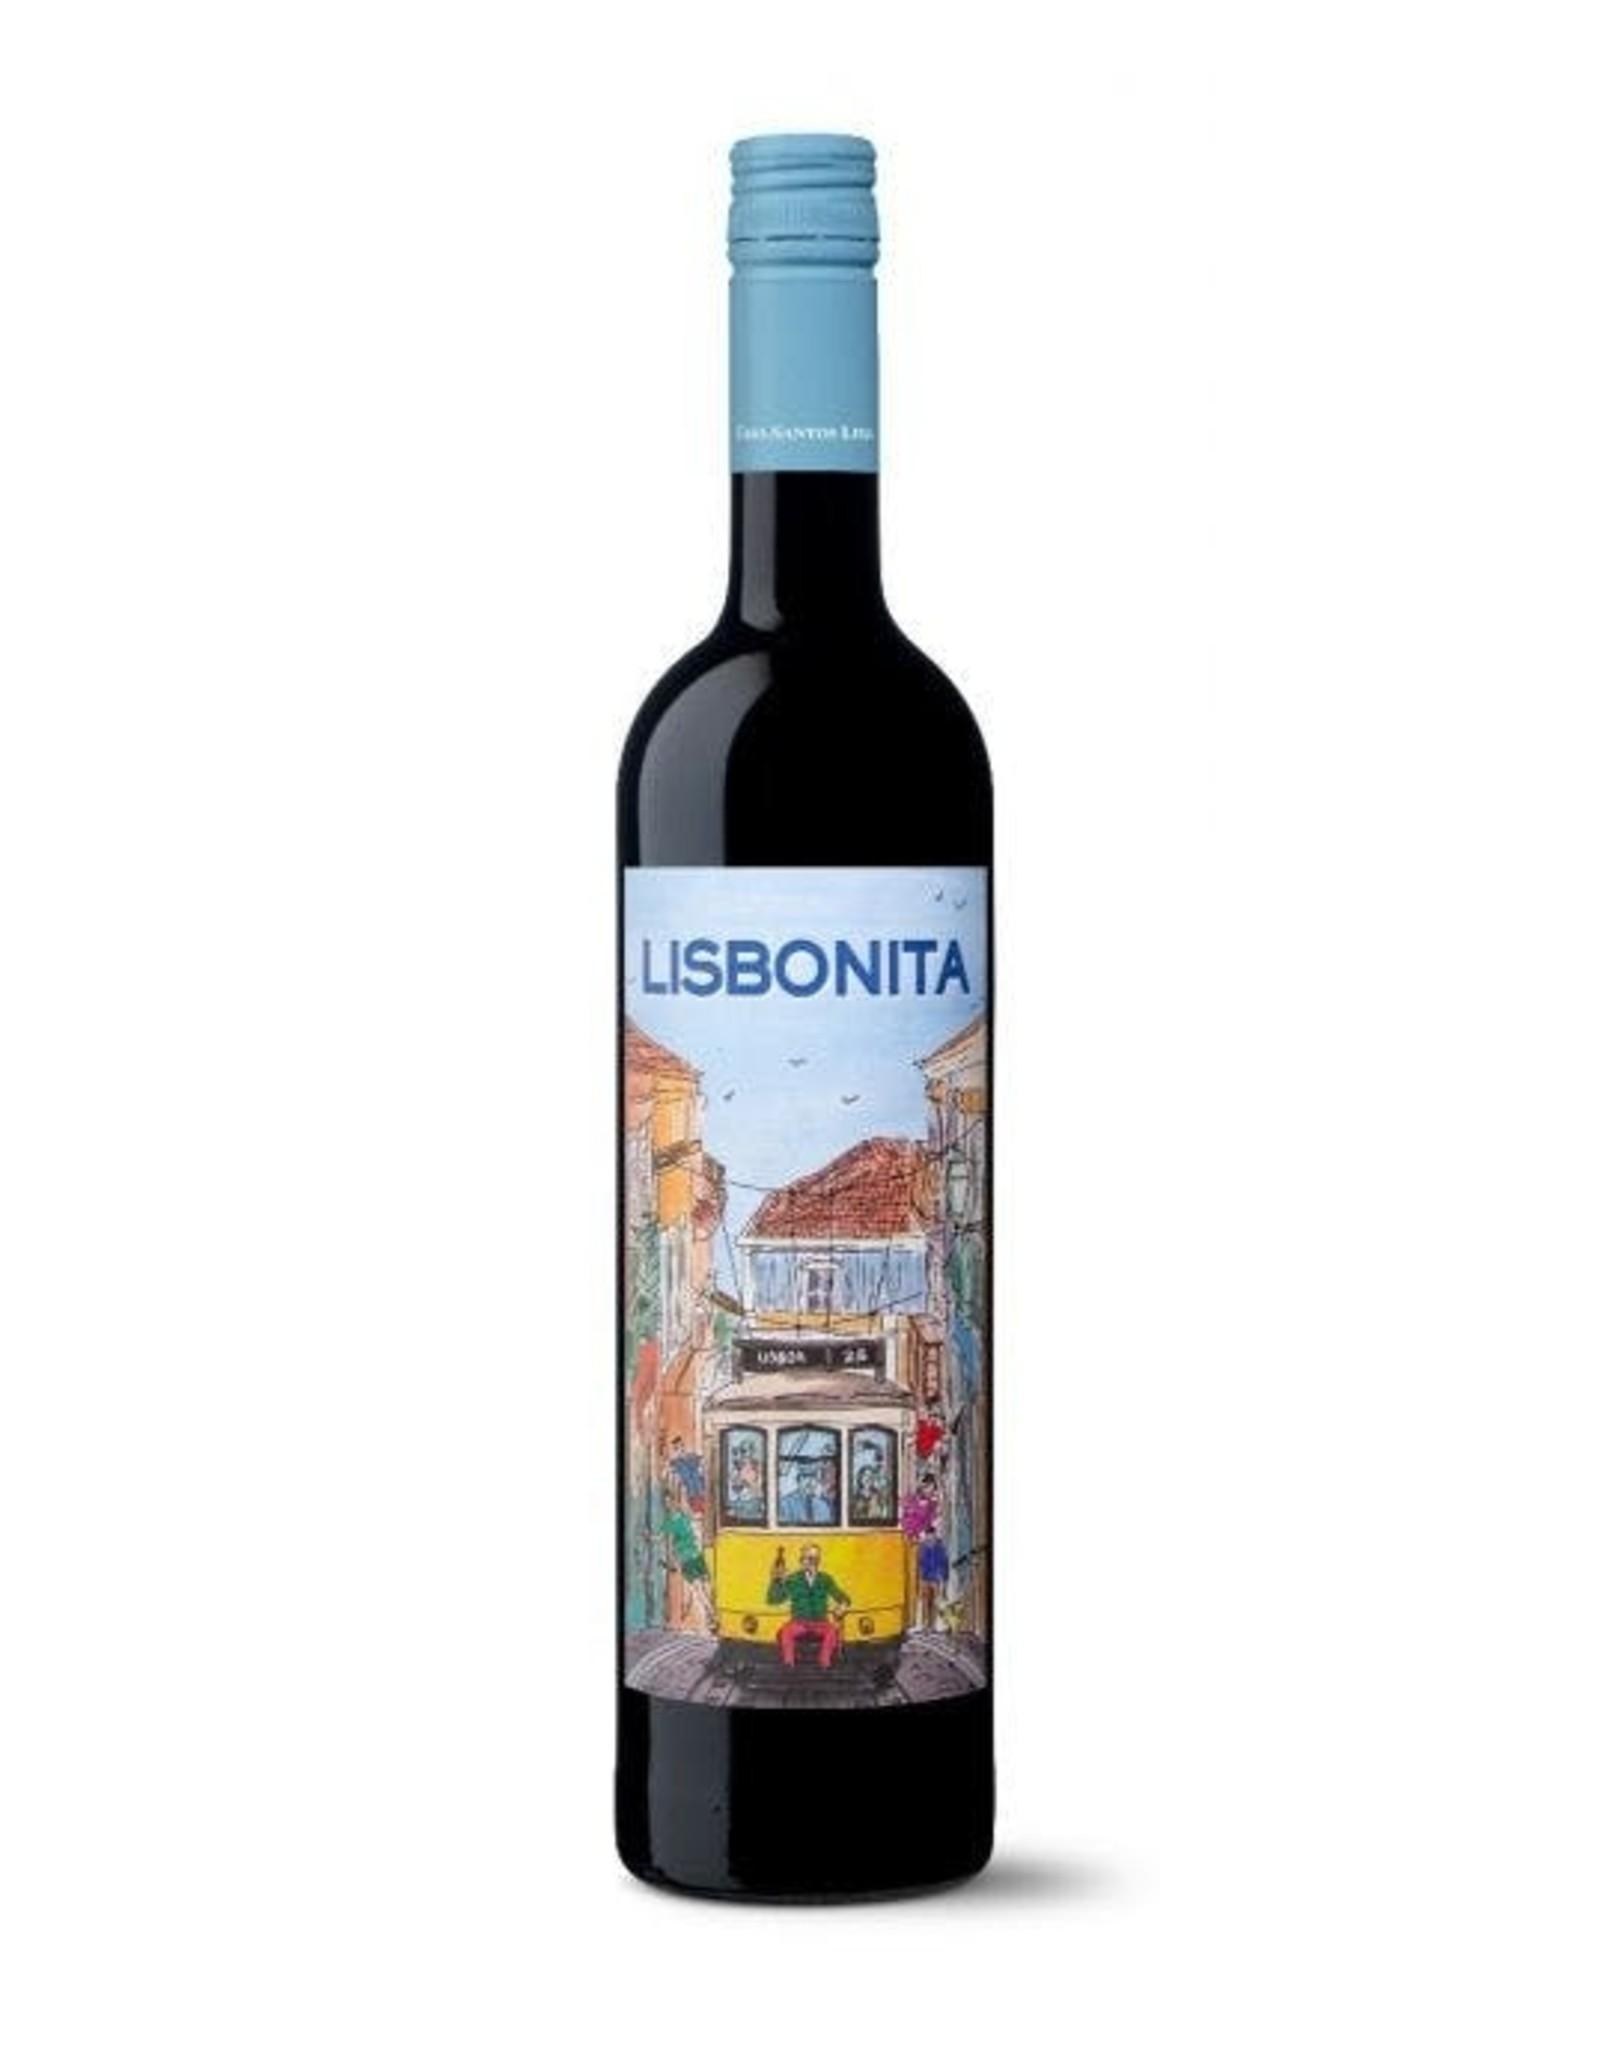 Portugal Lisbonita Red Blend